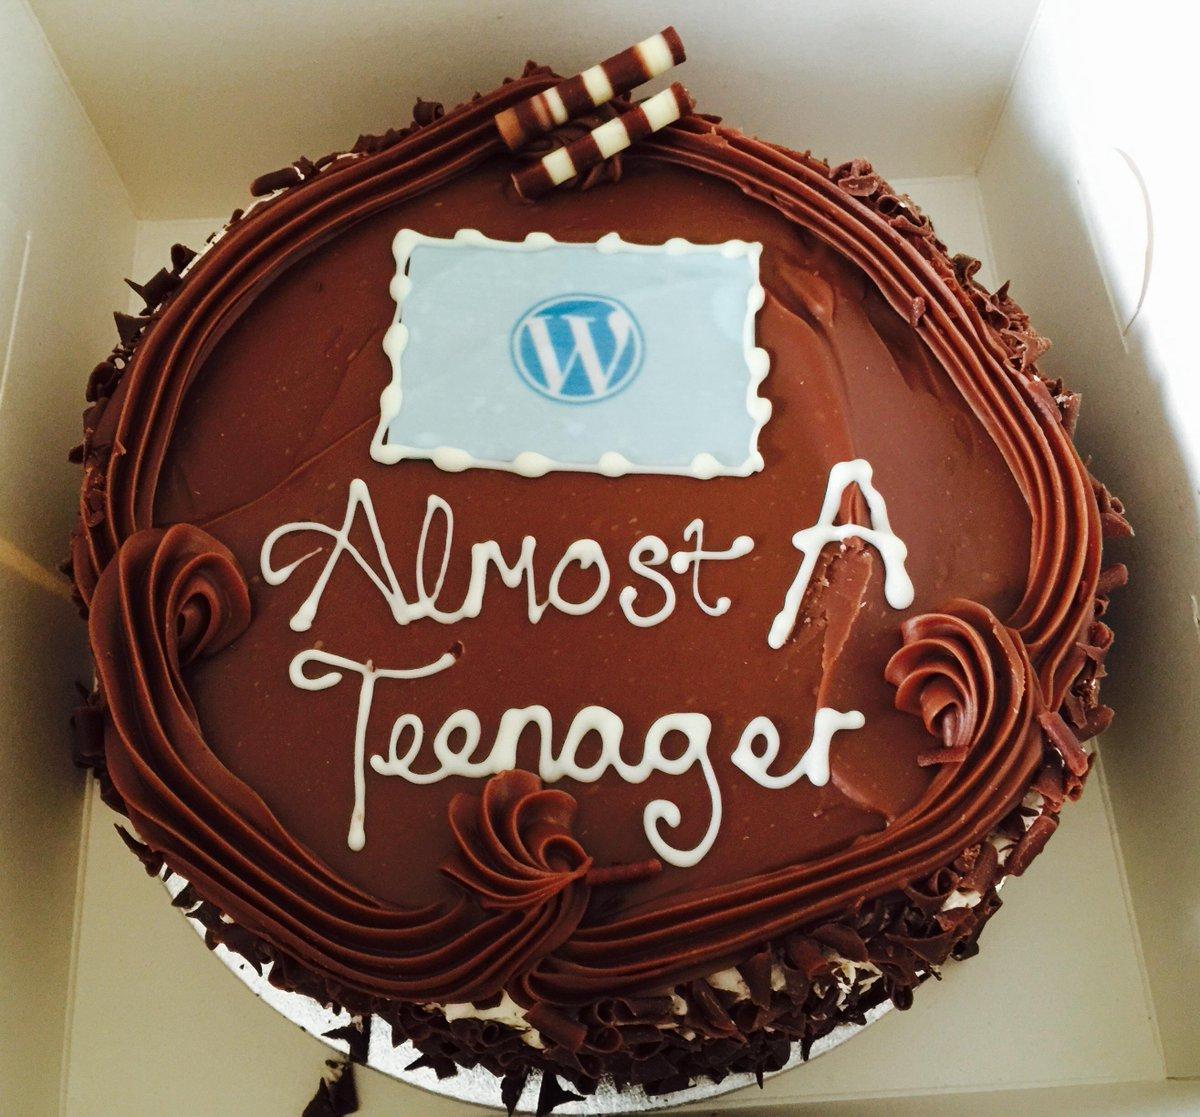 WordPress 12th birthdaycake https://t.co/MbZ720XHAM http://t.co/DF8FOUN9LE